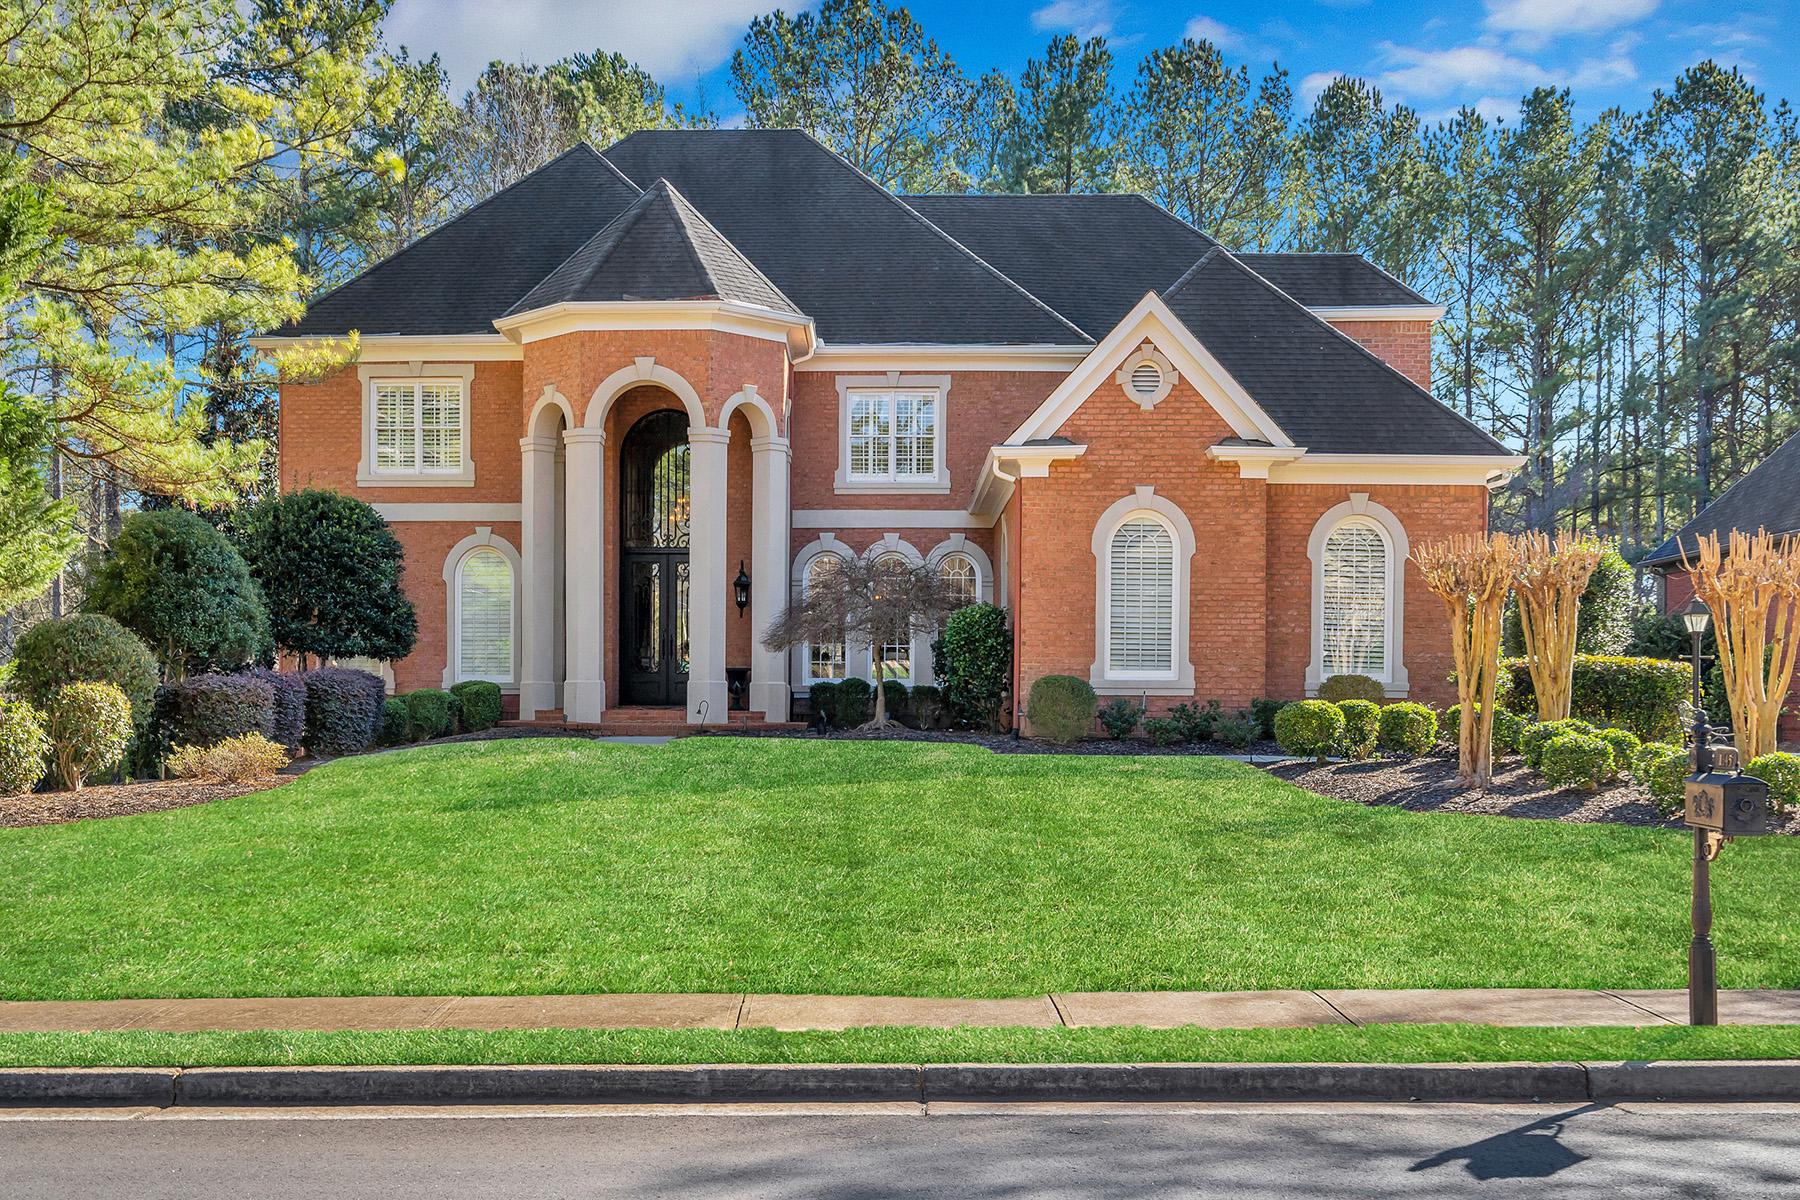 Single Family Homes для того Продажа на Stunning Brick Home On The Golf Course In Windward's Gated Northshore Community 1345 Portmarnock Drive, Alpharetta, Джорджия 30005 Соединенные Штаты